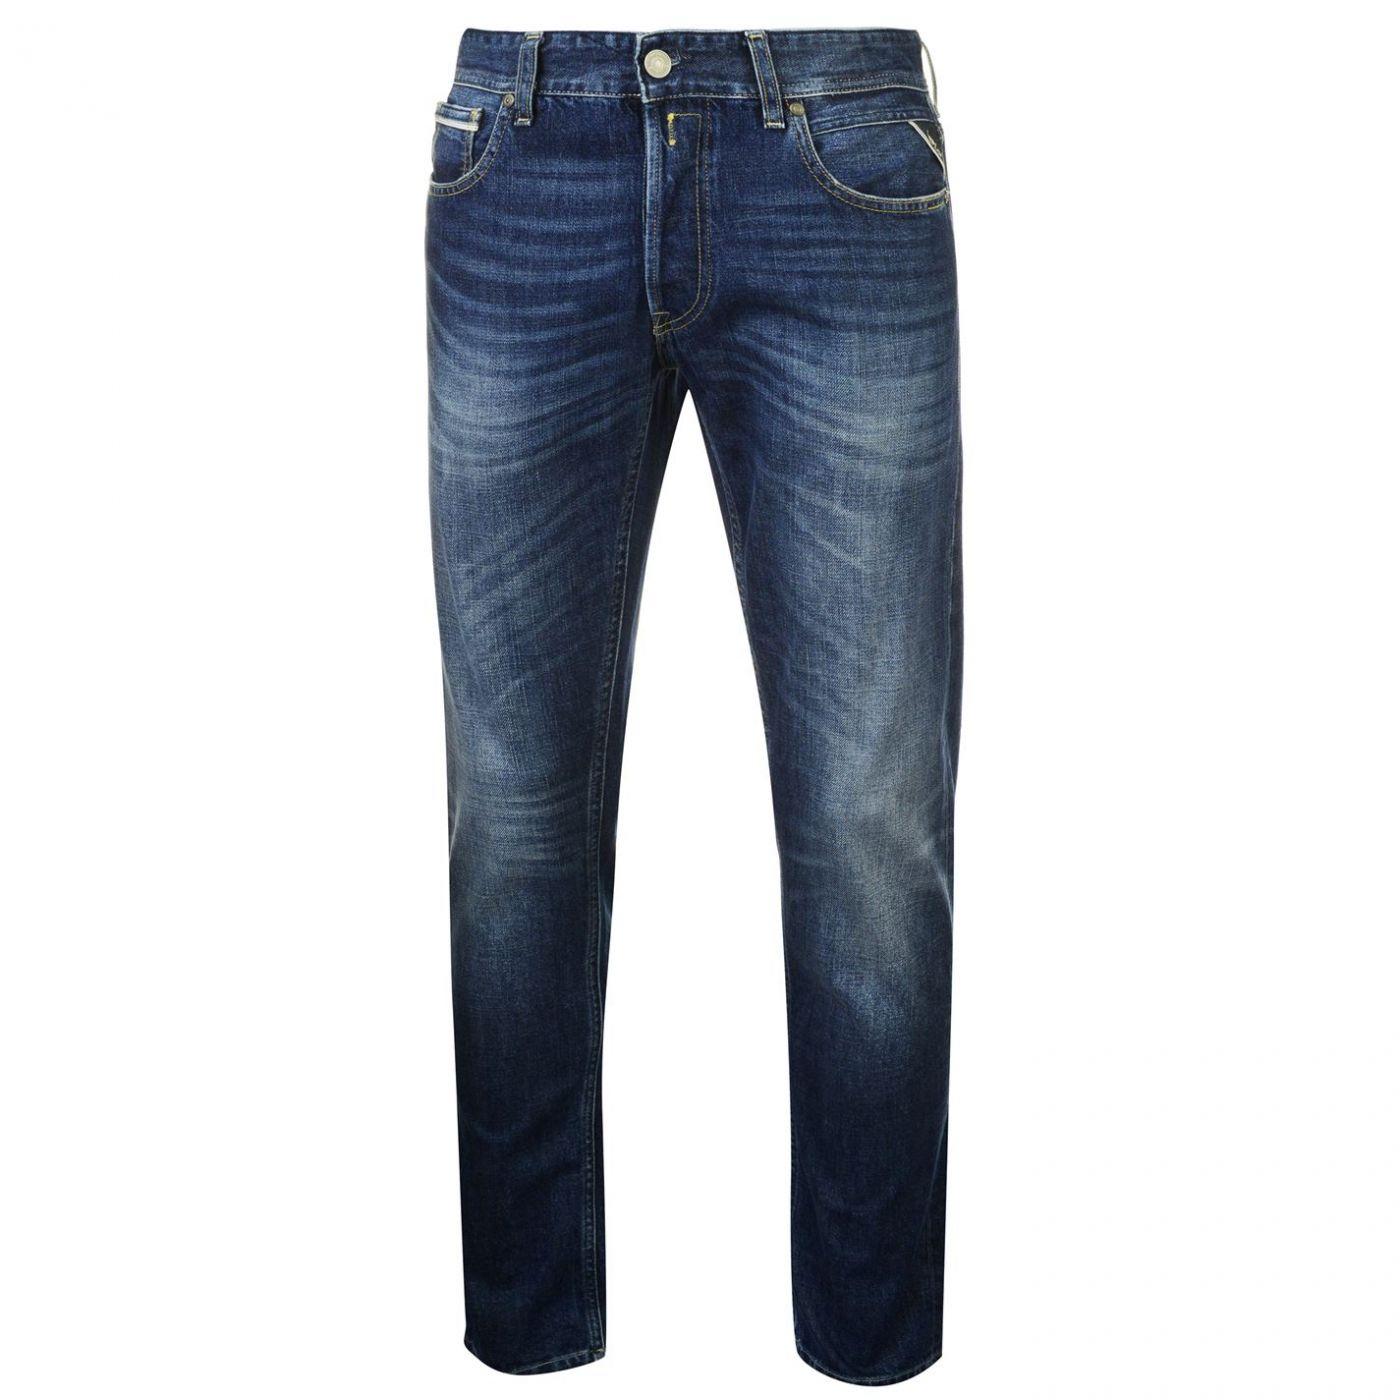 Replay Grover Slim Jeans Mens